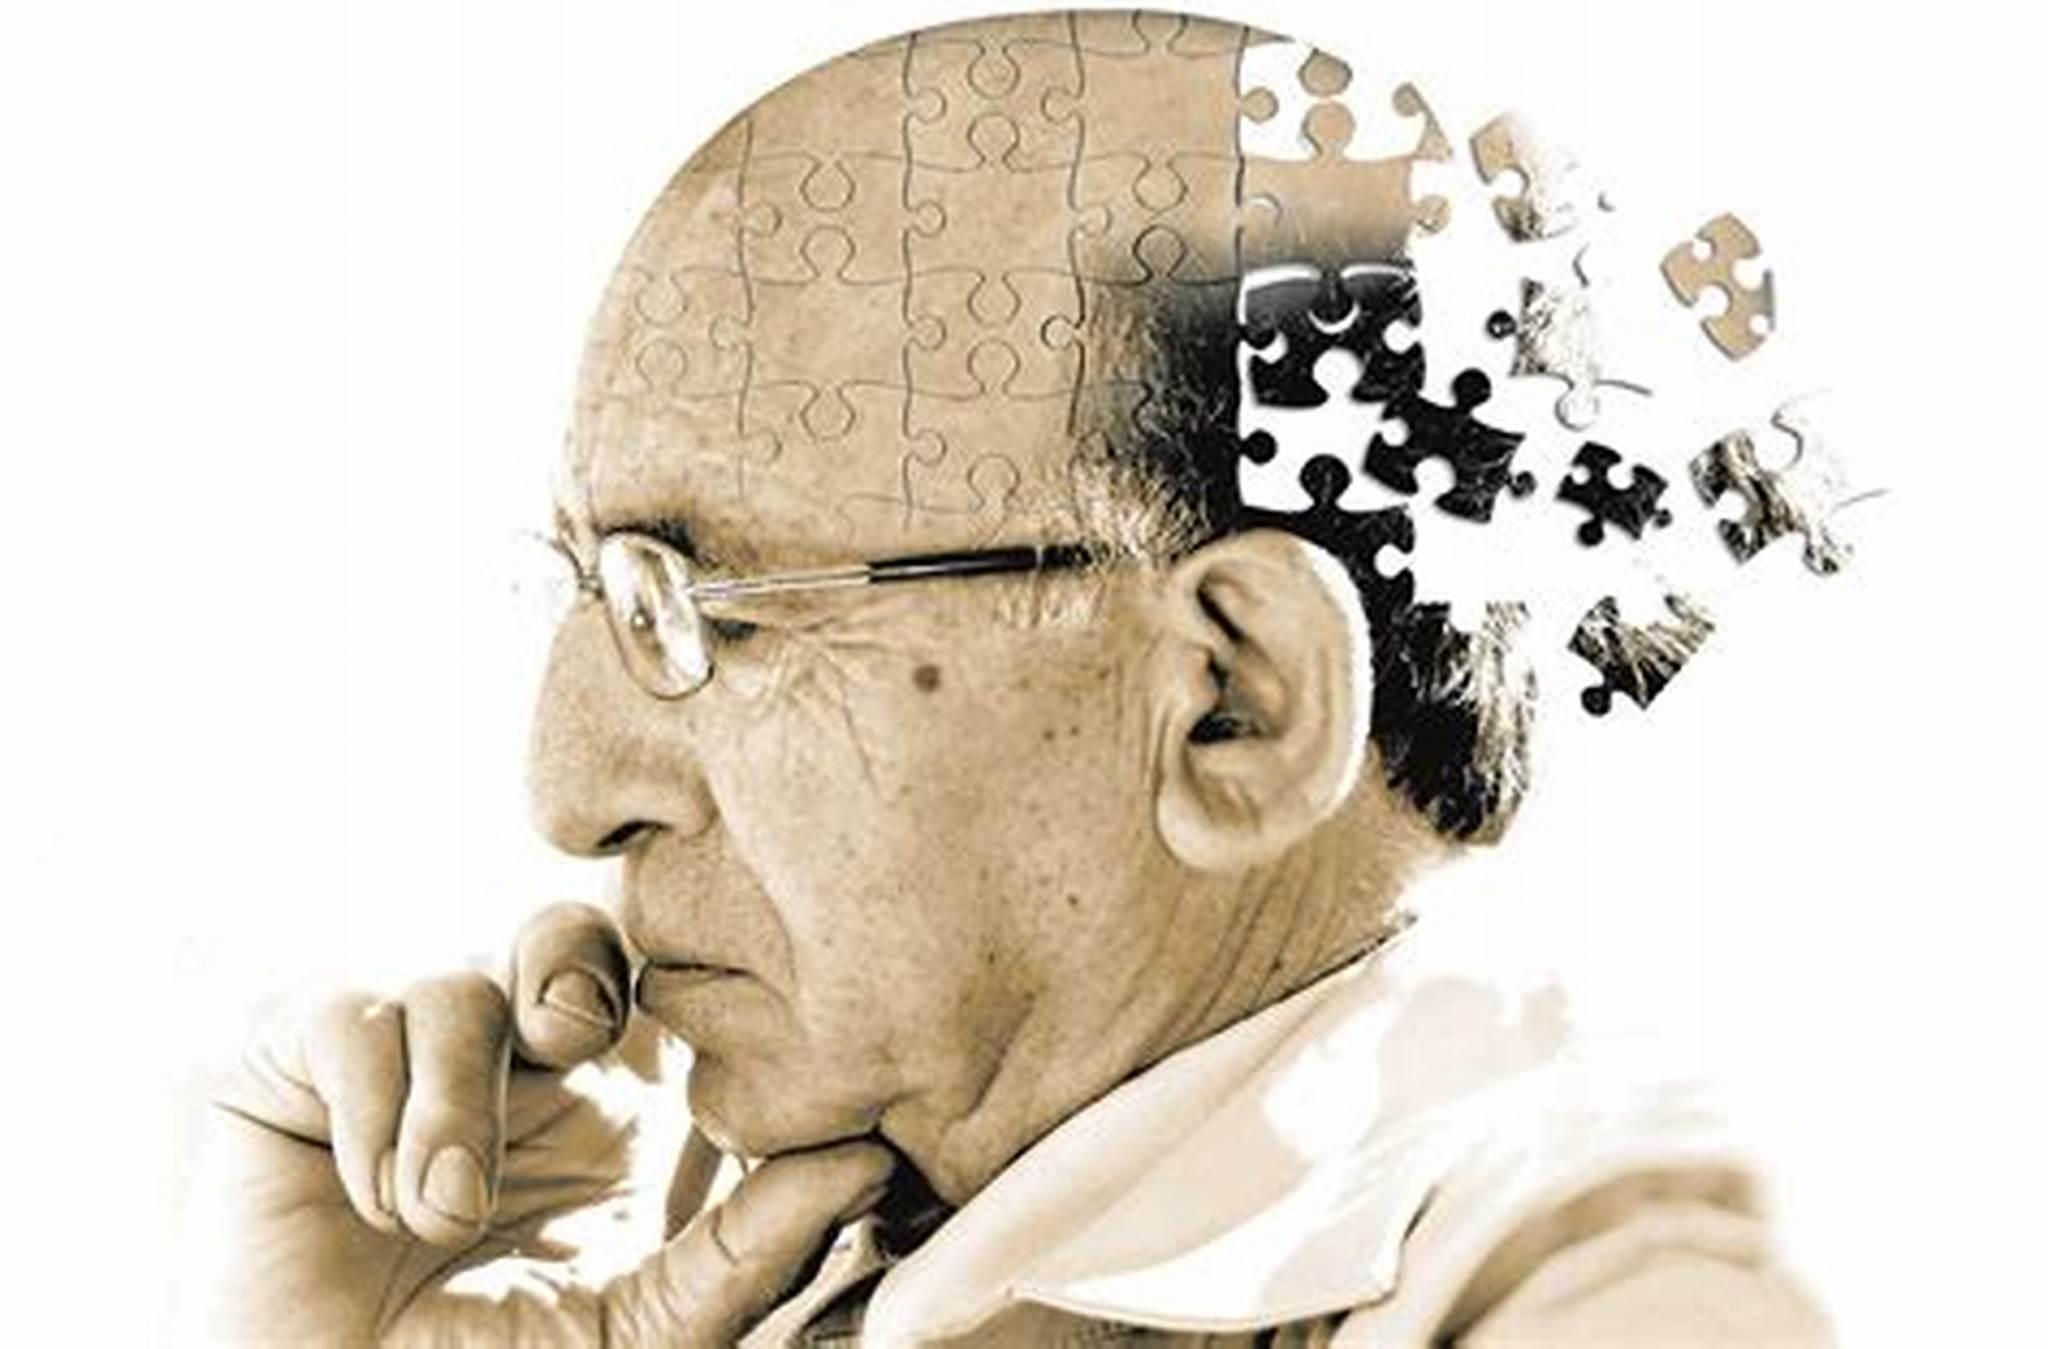 GeneMail周报 | Nature:治疗阿茨海默症或可采用HIV疗法;K药拟纳入深圳医保